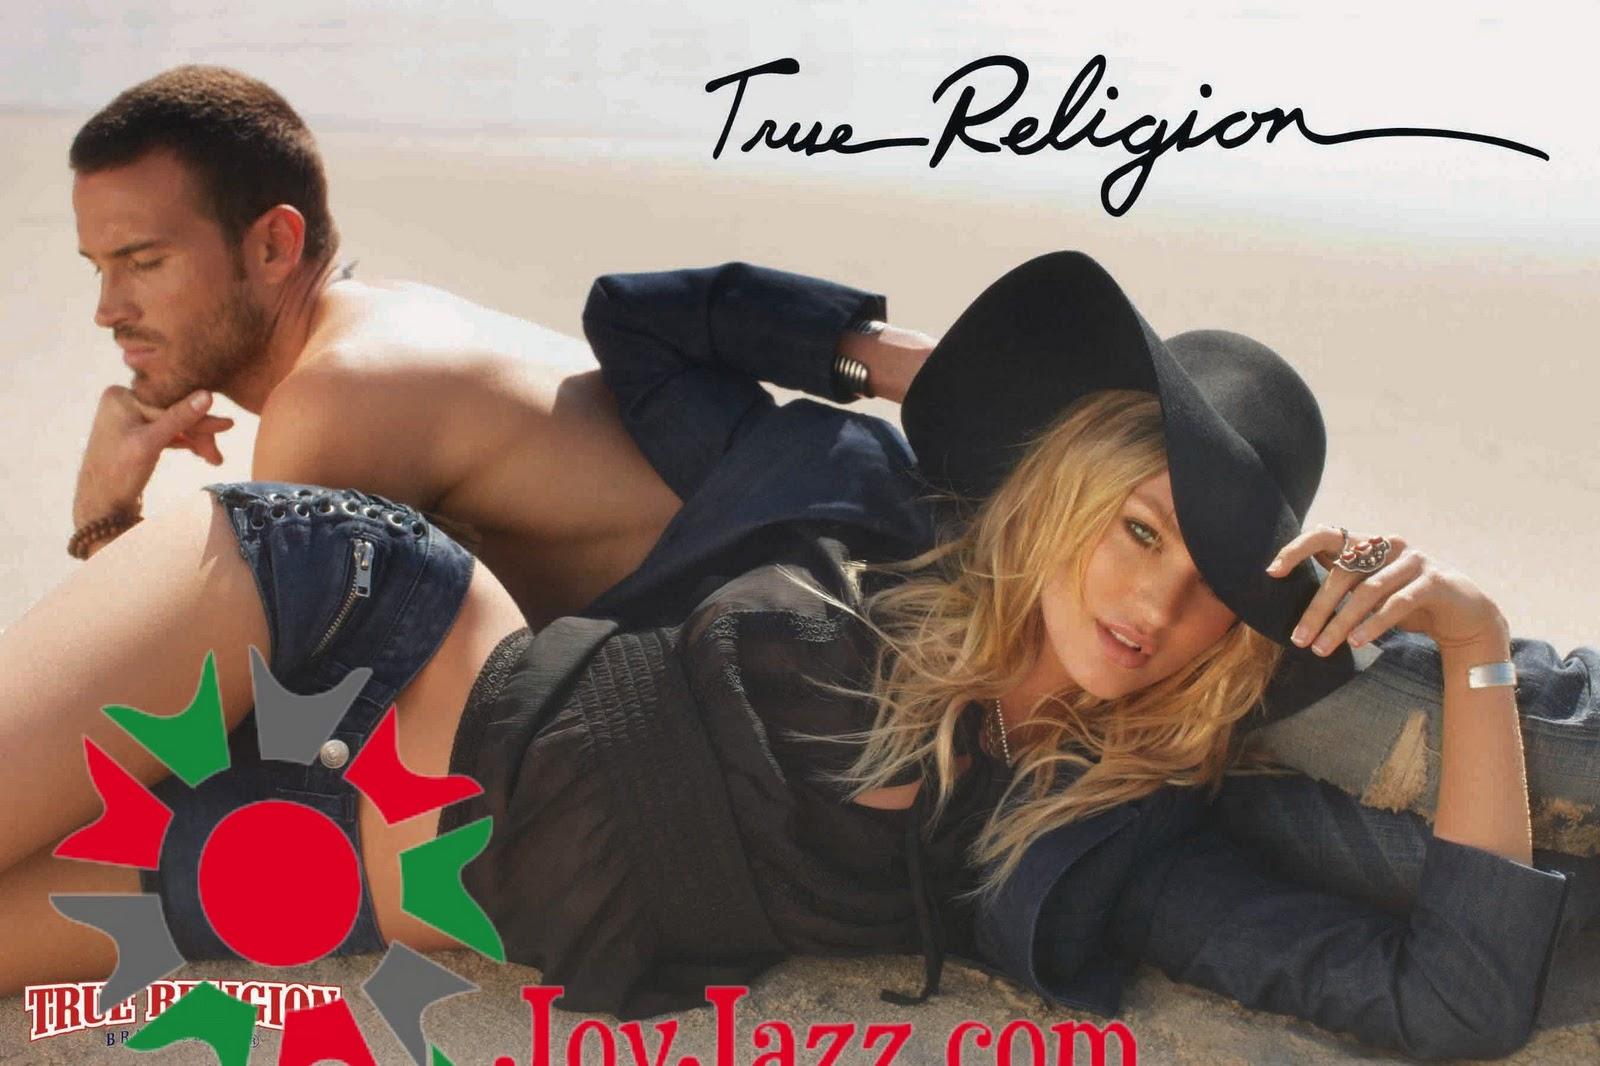 http://2.bp.blogspot.com/_0LdSrYkvVVk/TVLYsuTJpjI/AAAAAAAACXg/usdUEKGuBrQ/s1600/Candice-Swanepoel-43.jpg